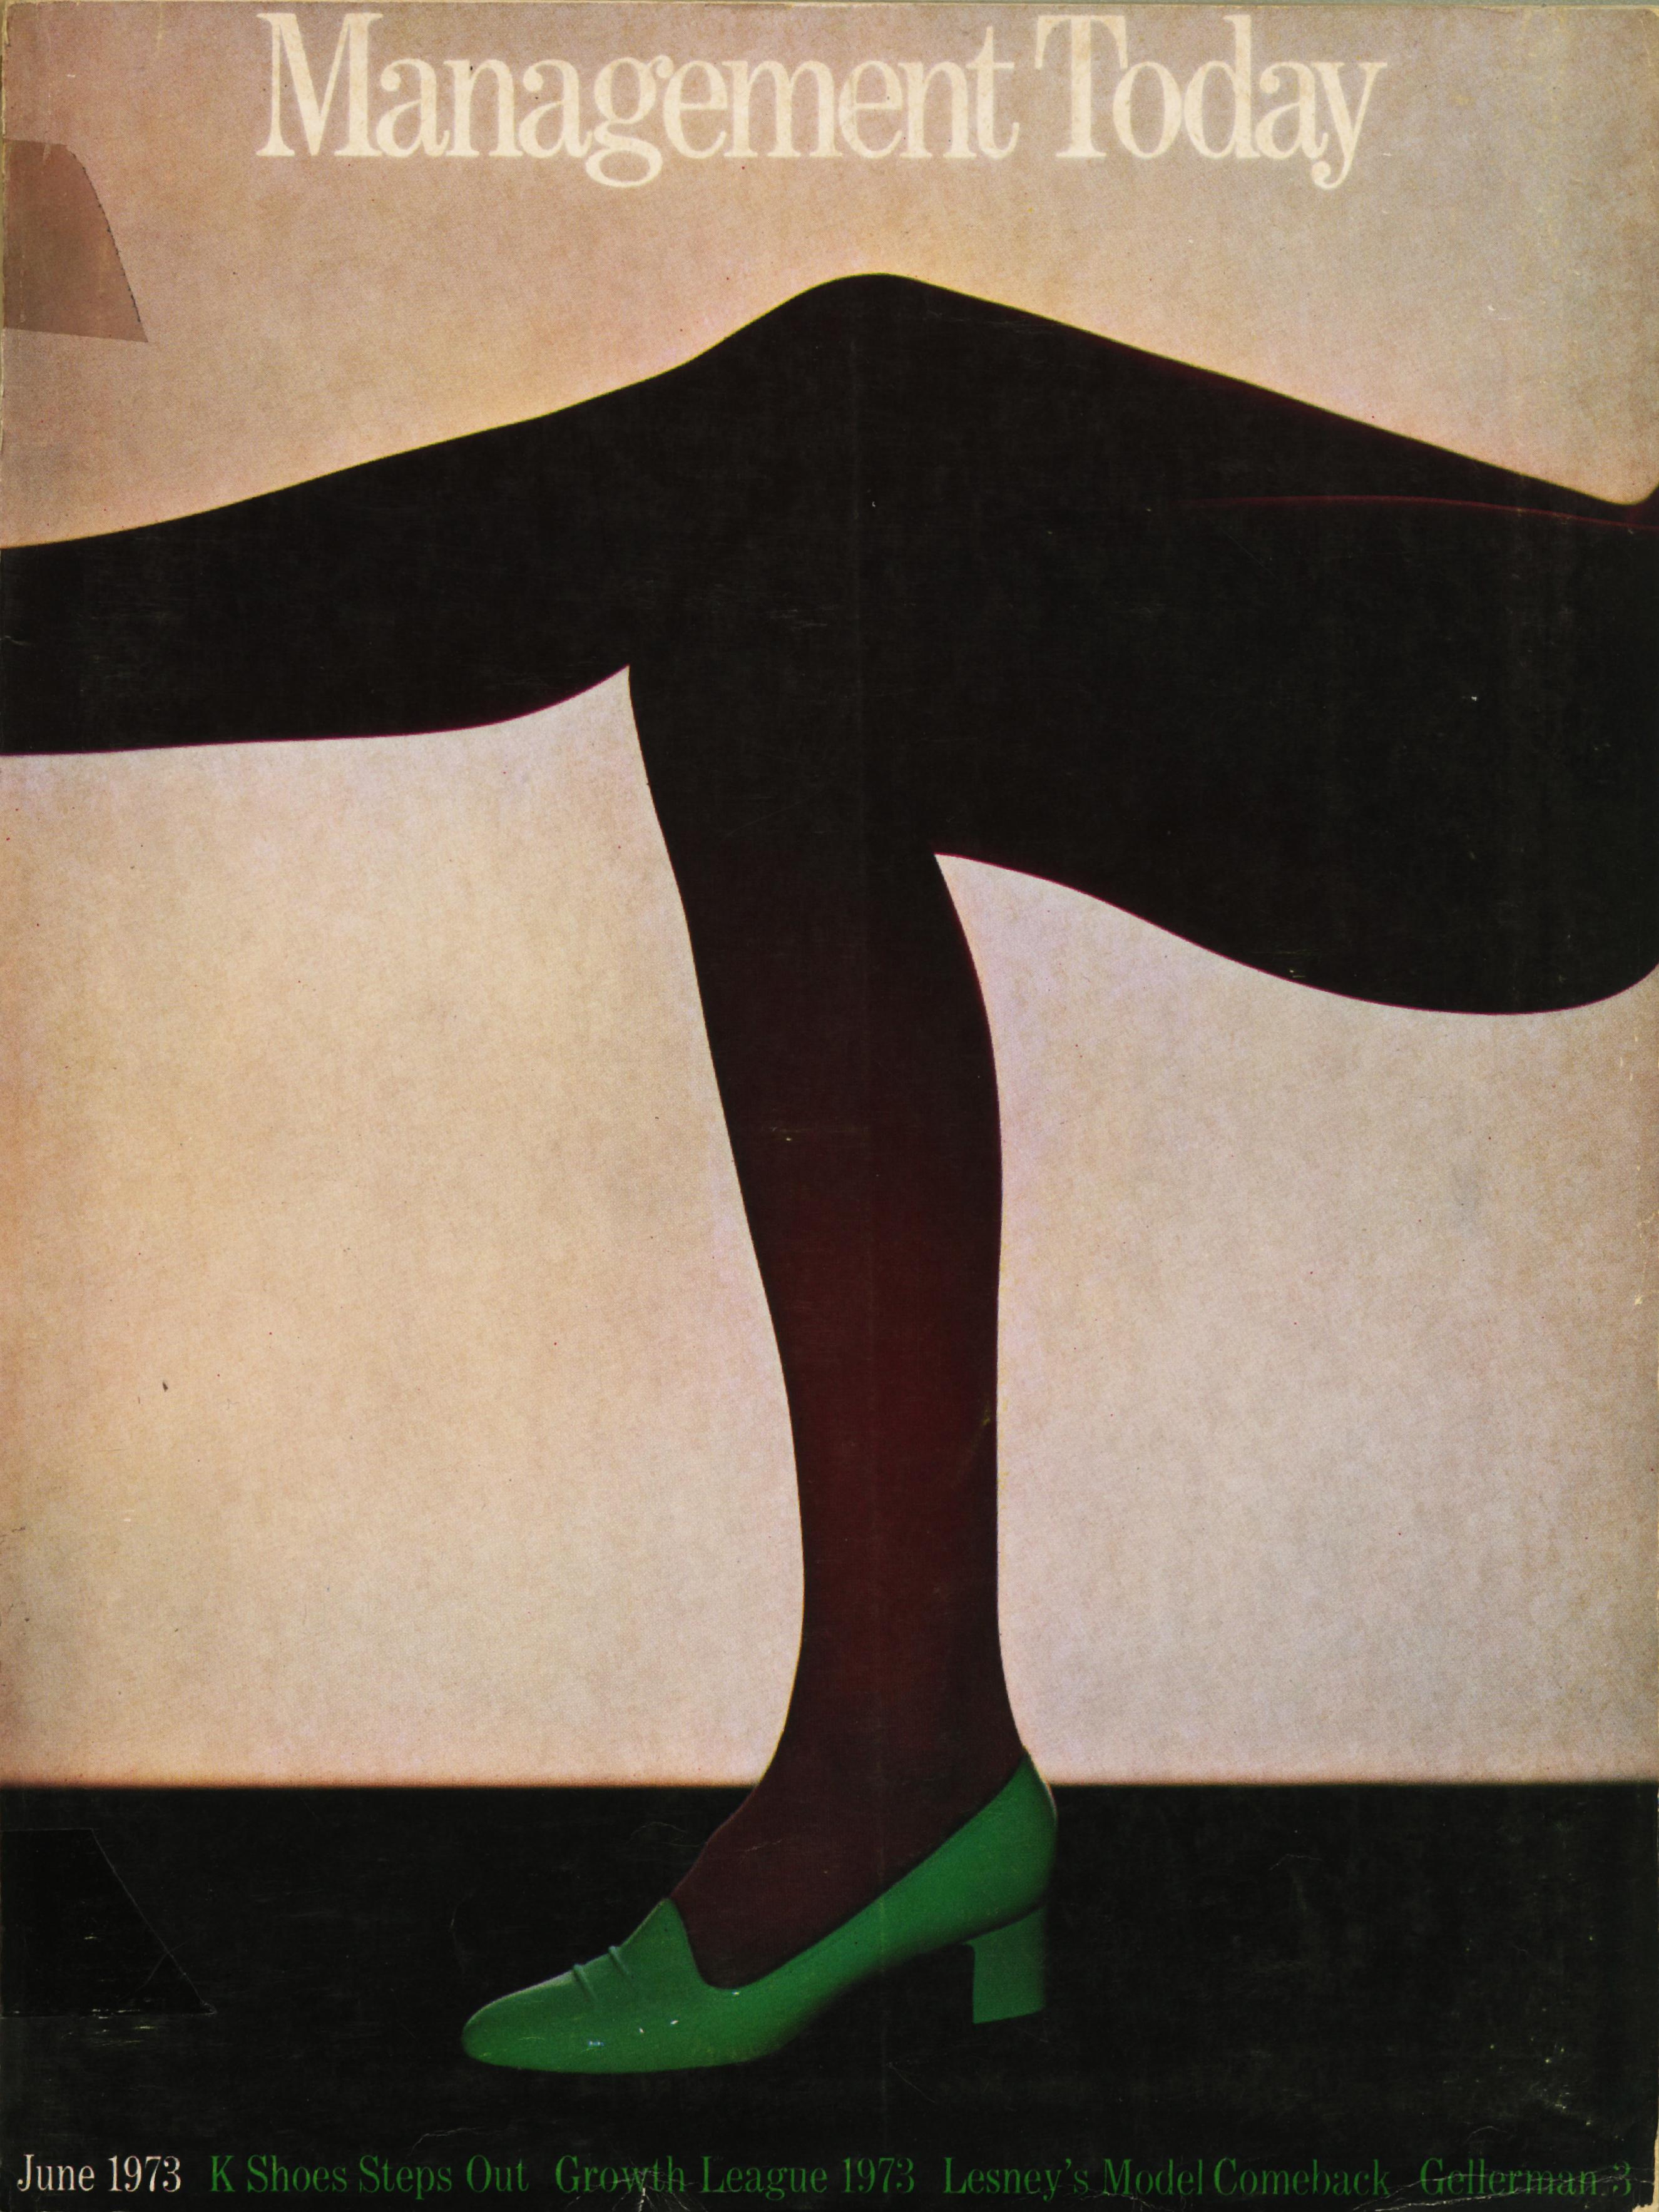 Lester Bookbinder, Management Today 'Green Shoe'**